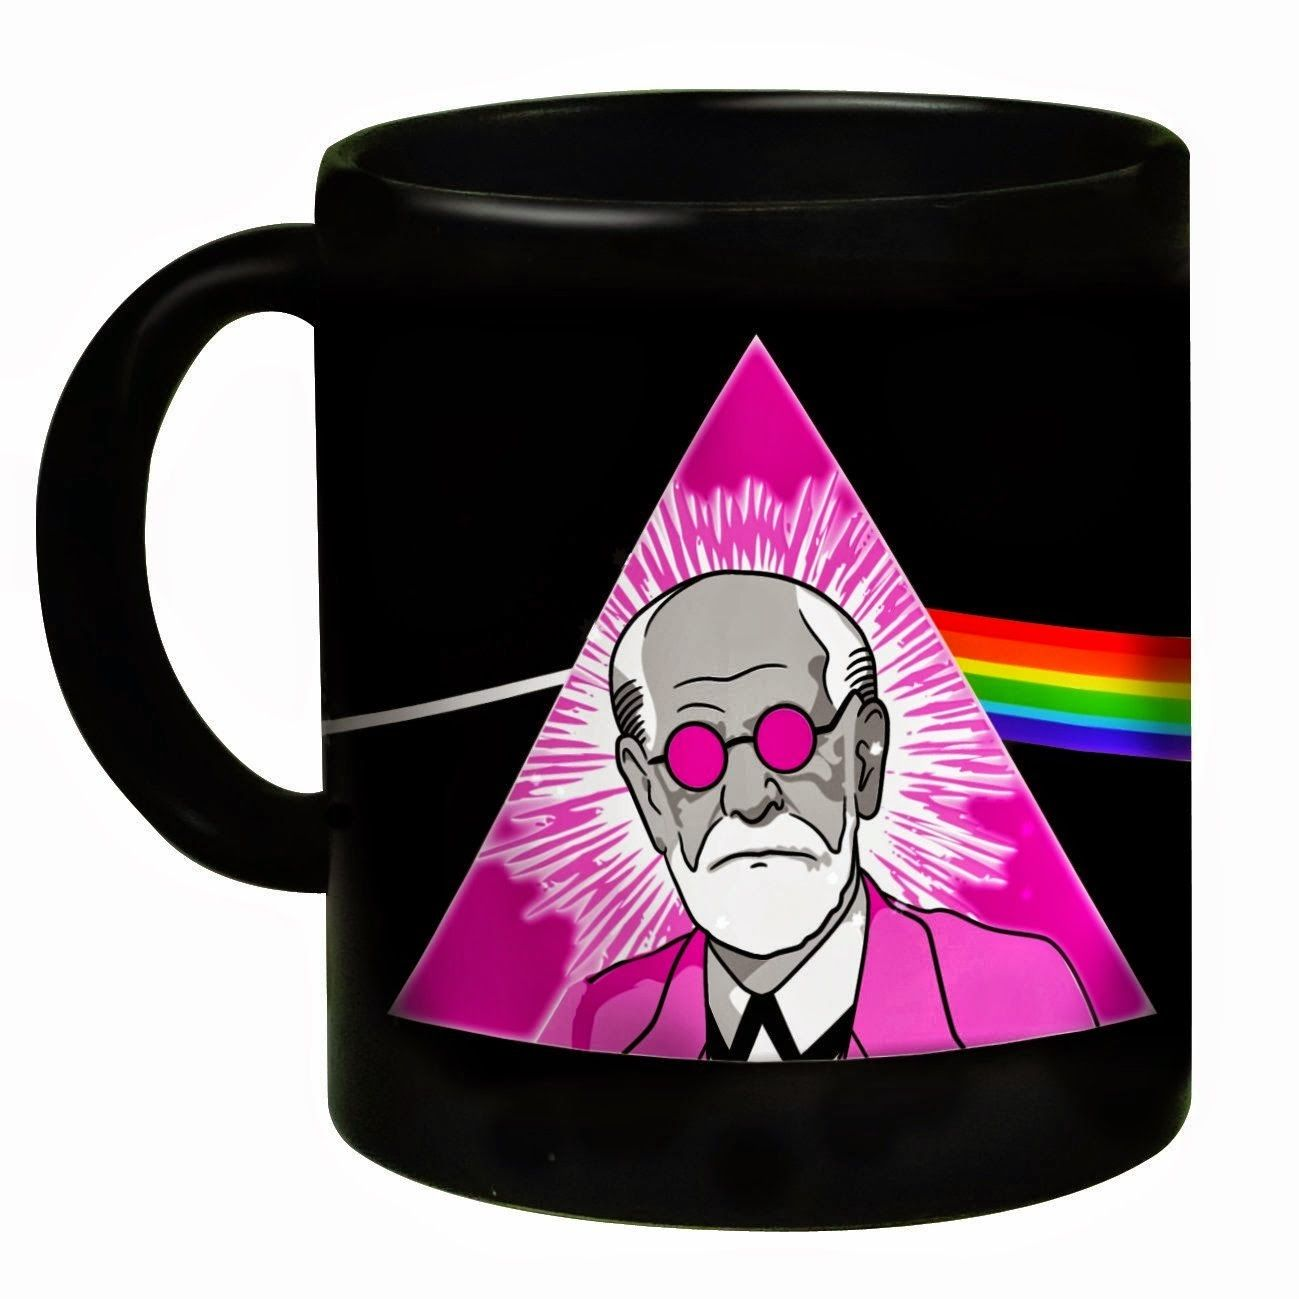 Pink Freud Mug Mugs, Psychology gifts, Mug designs